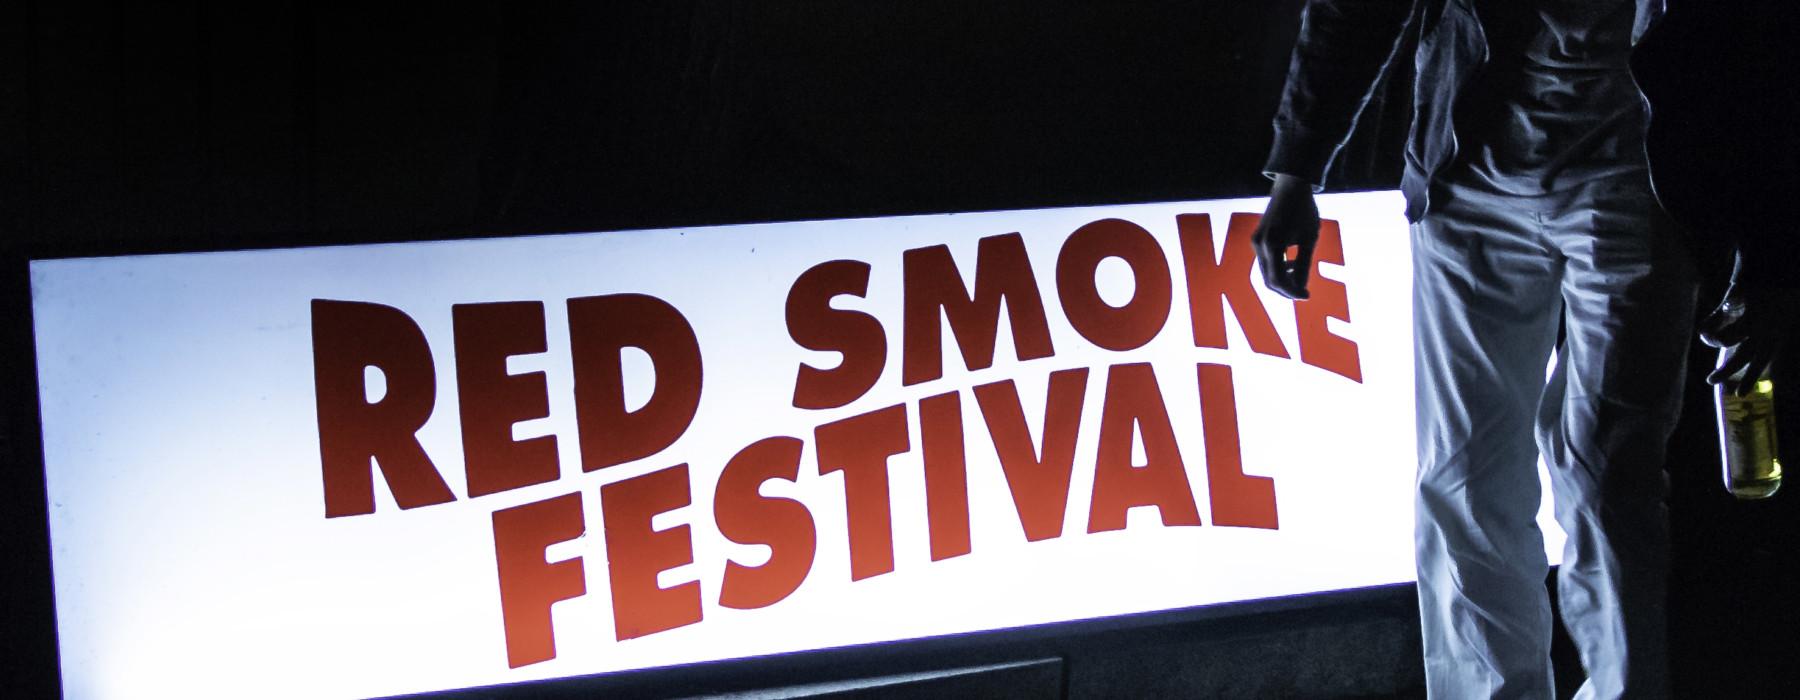 Festival Report : Red Smoke Festival 2019